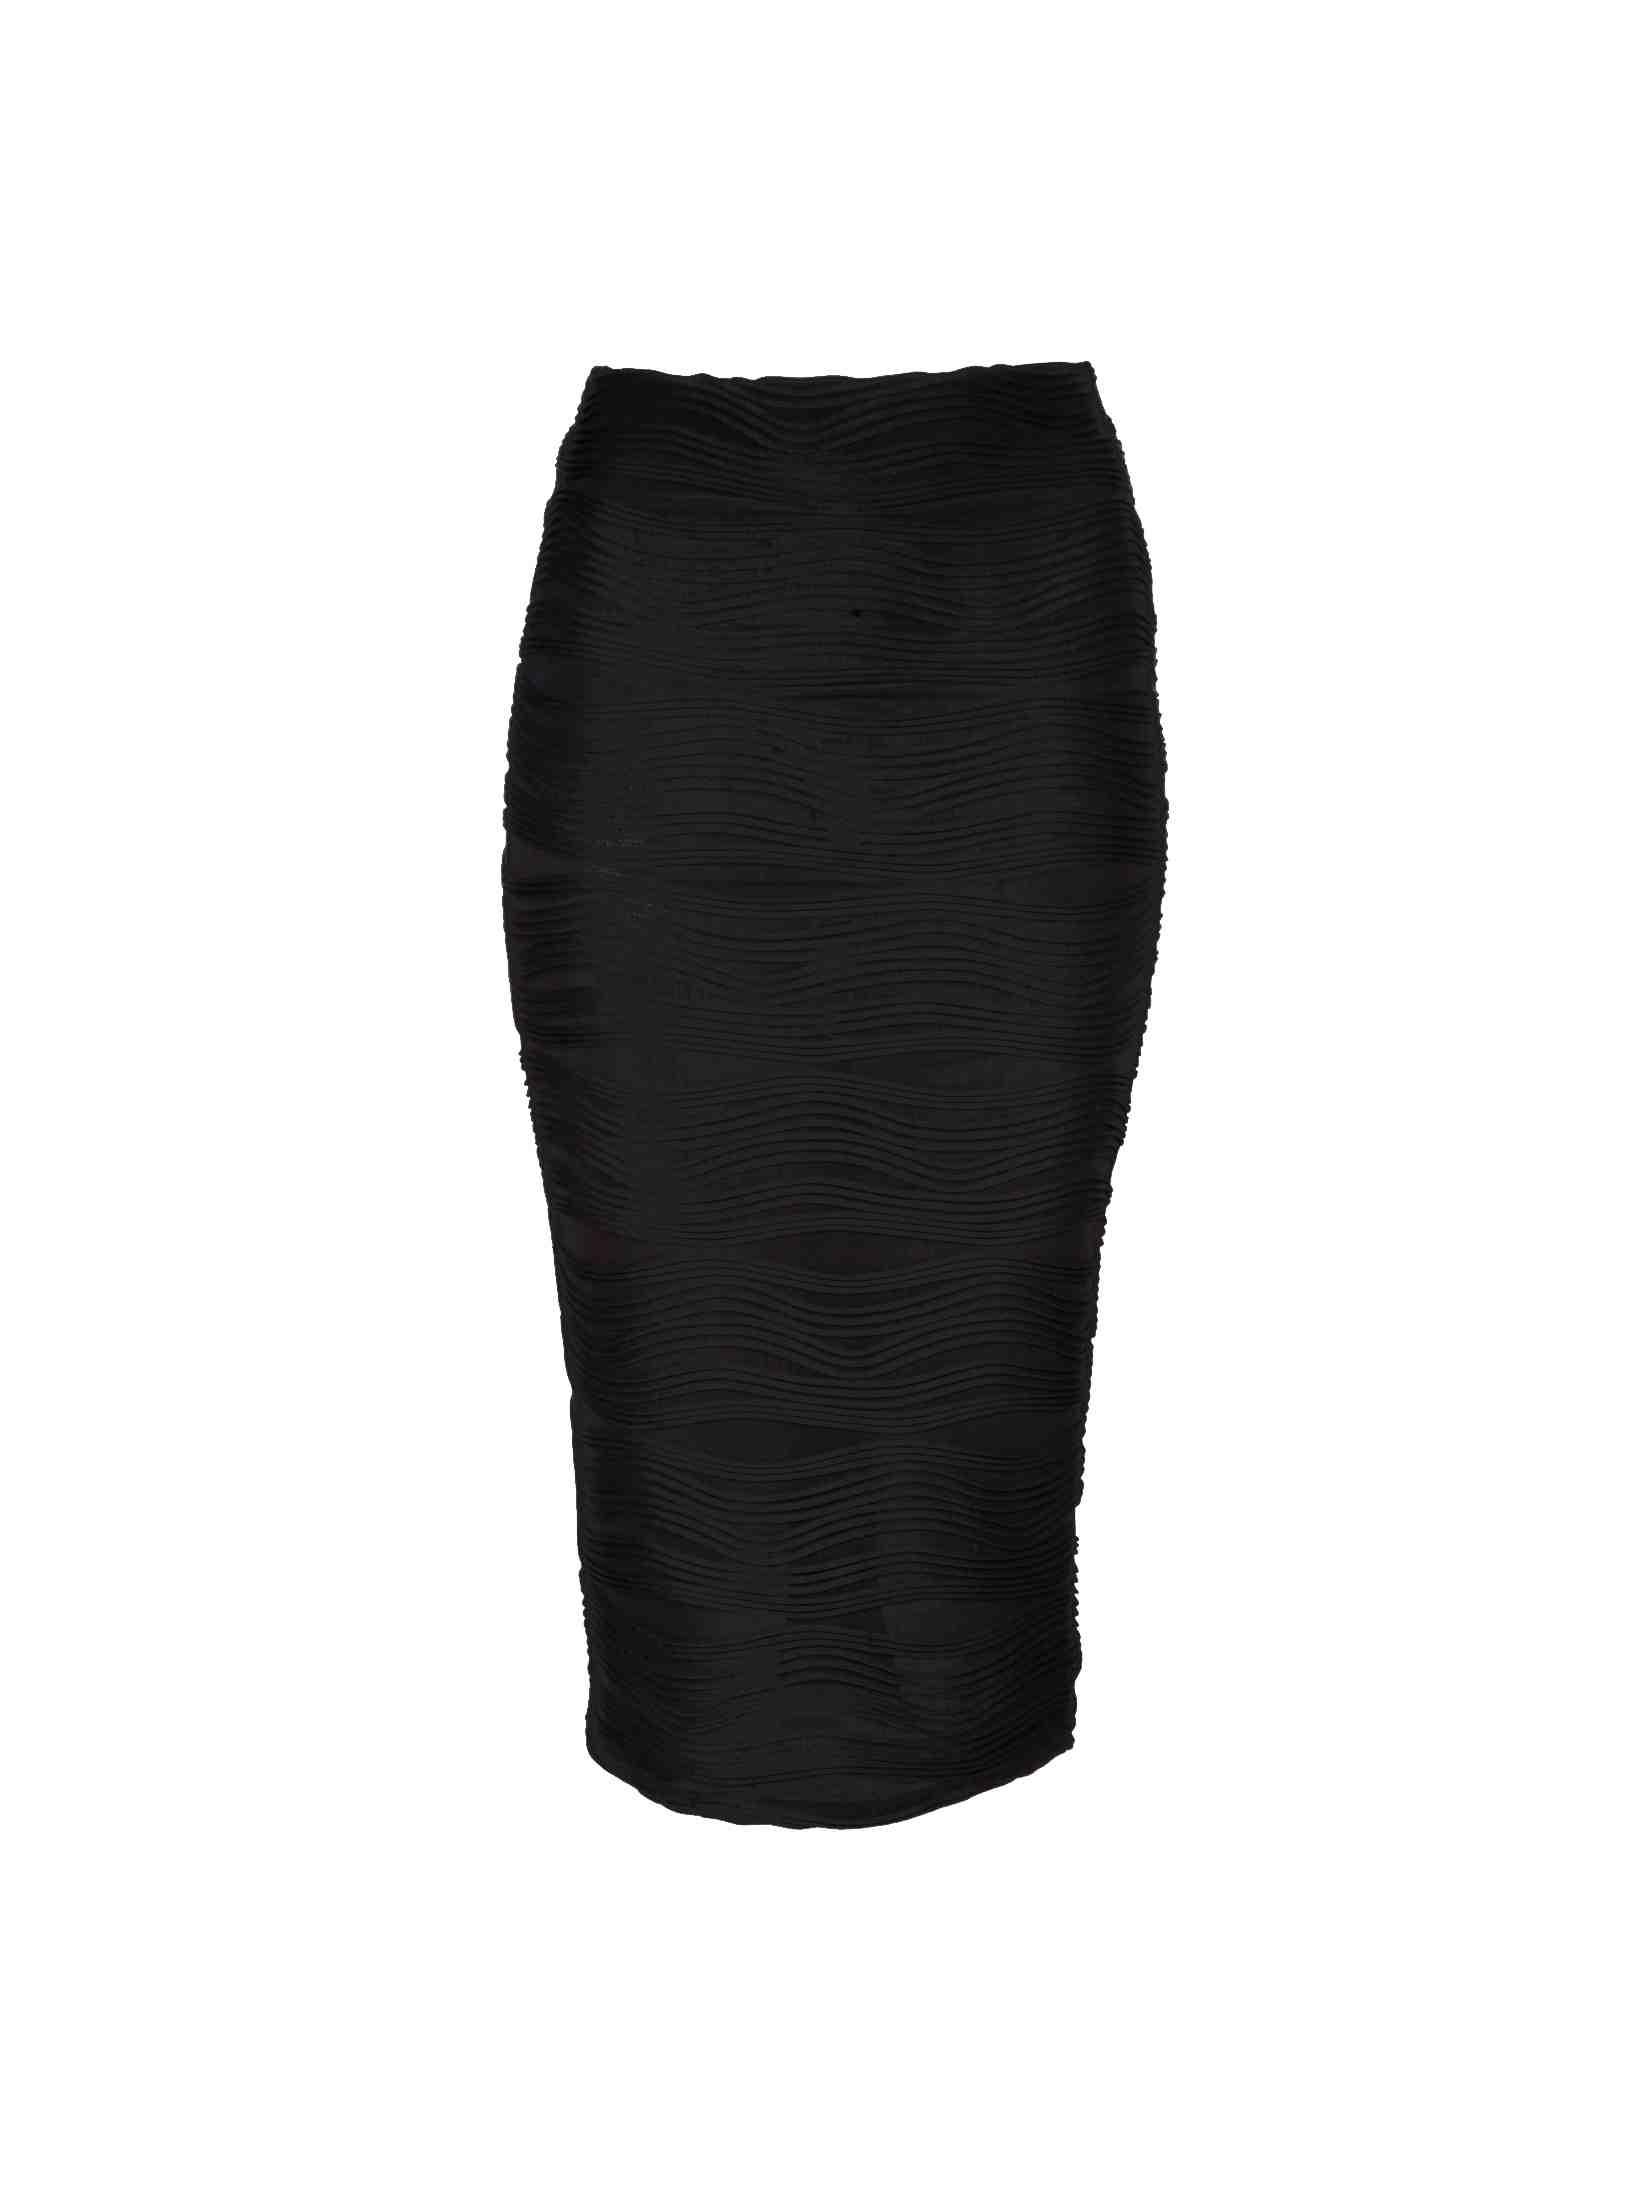 Ripple Wave Skirt | Jane Norman